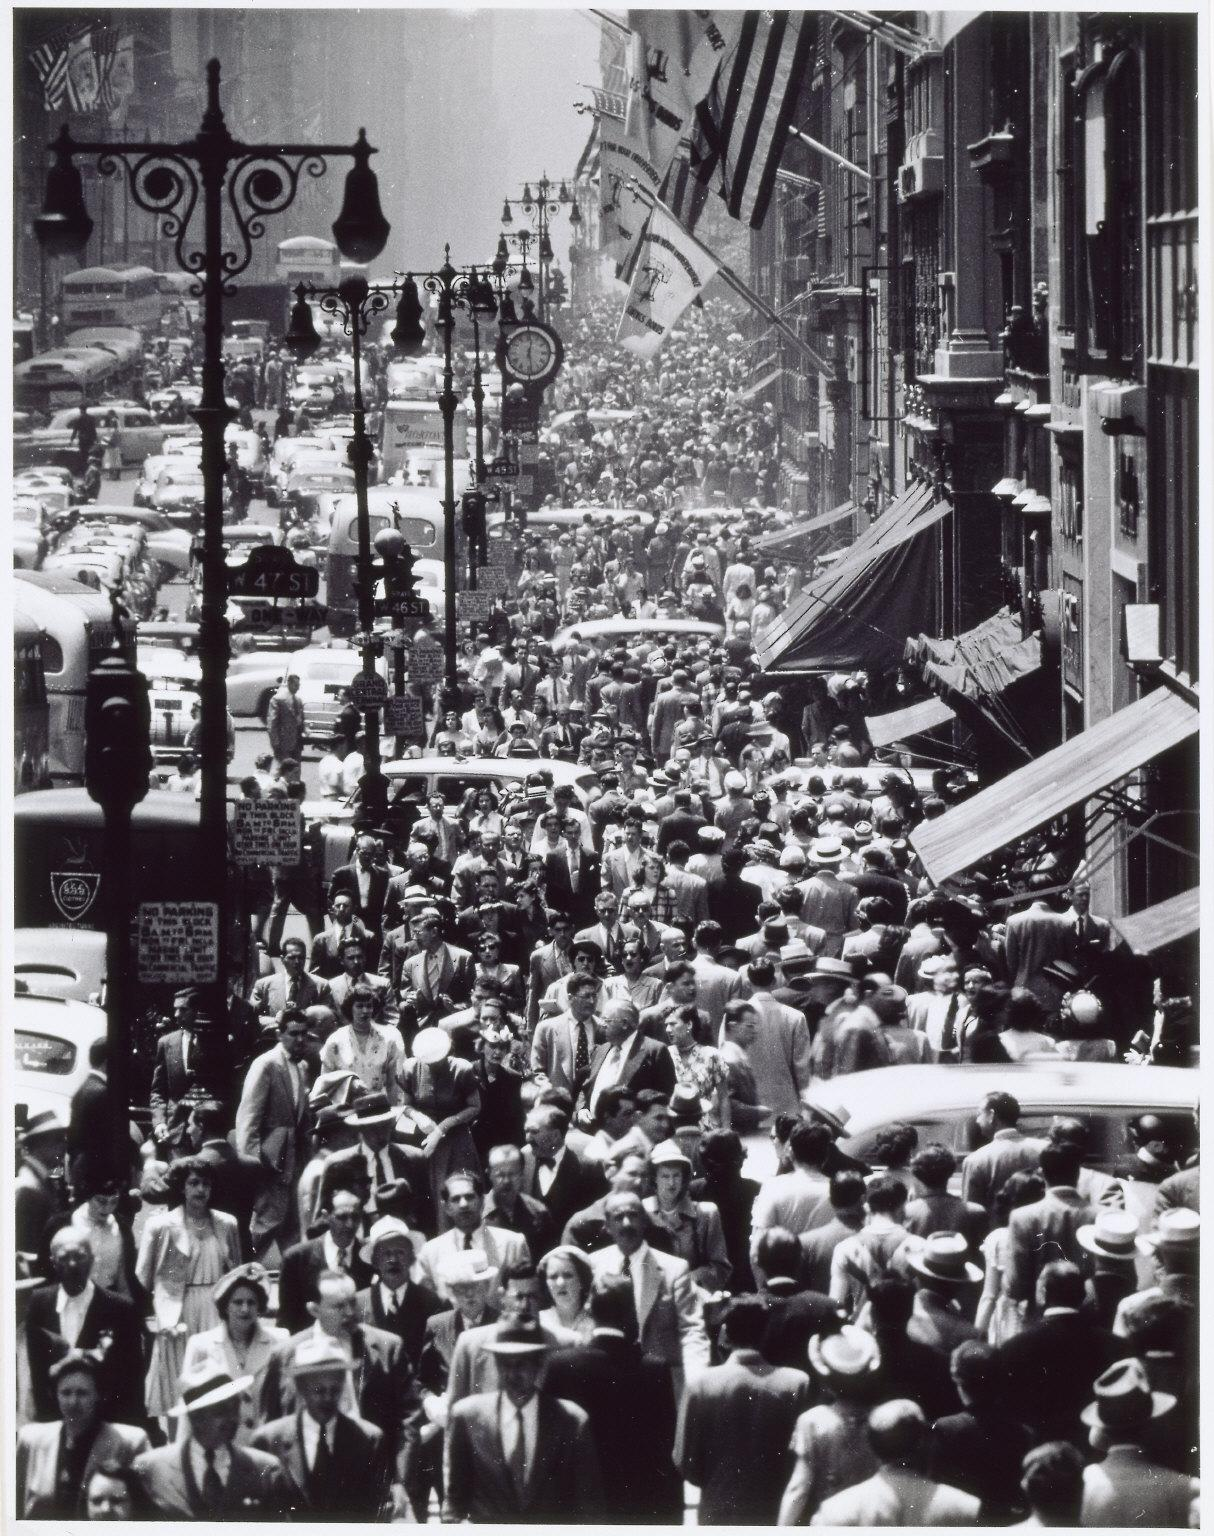 Andreas Feininger Lunch Rush On Fifth Avenue New York C